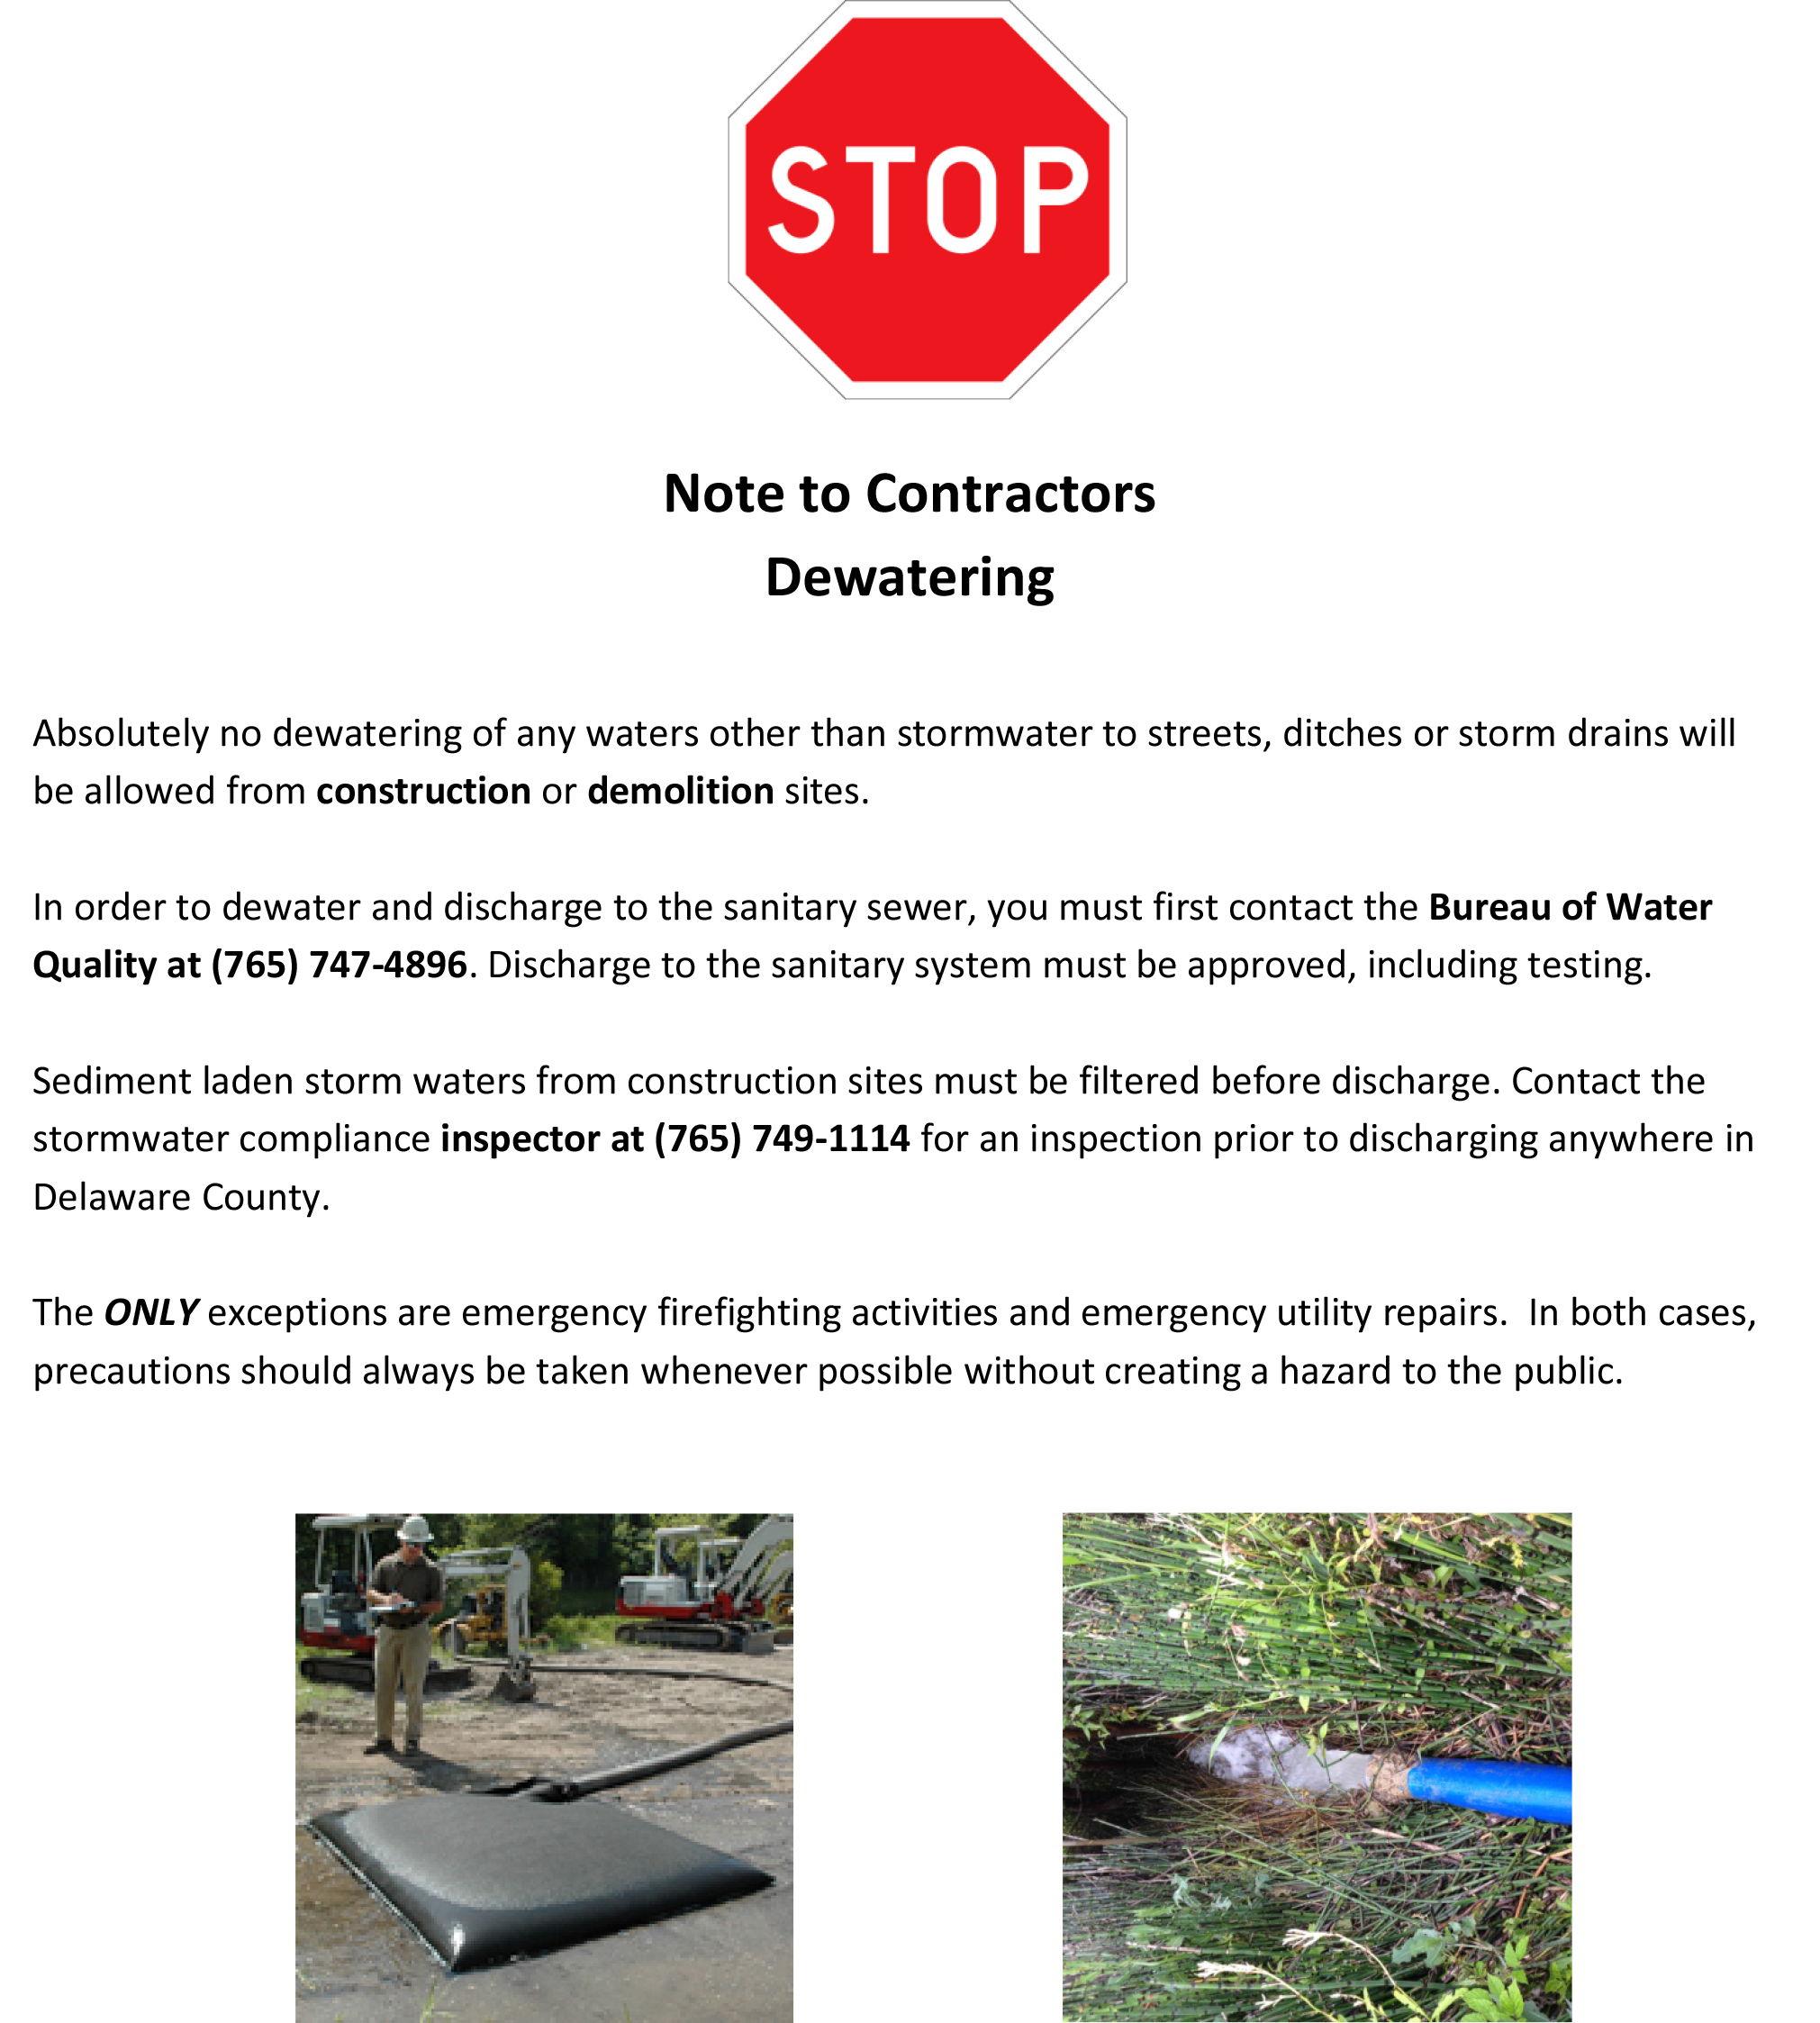 Note to Contractors Dewatering